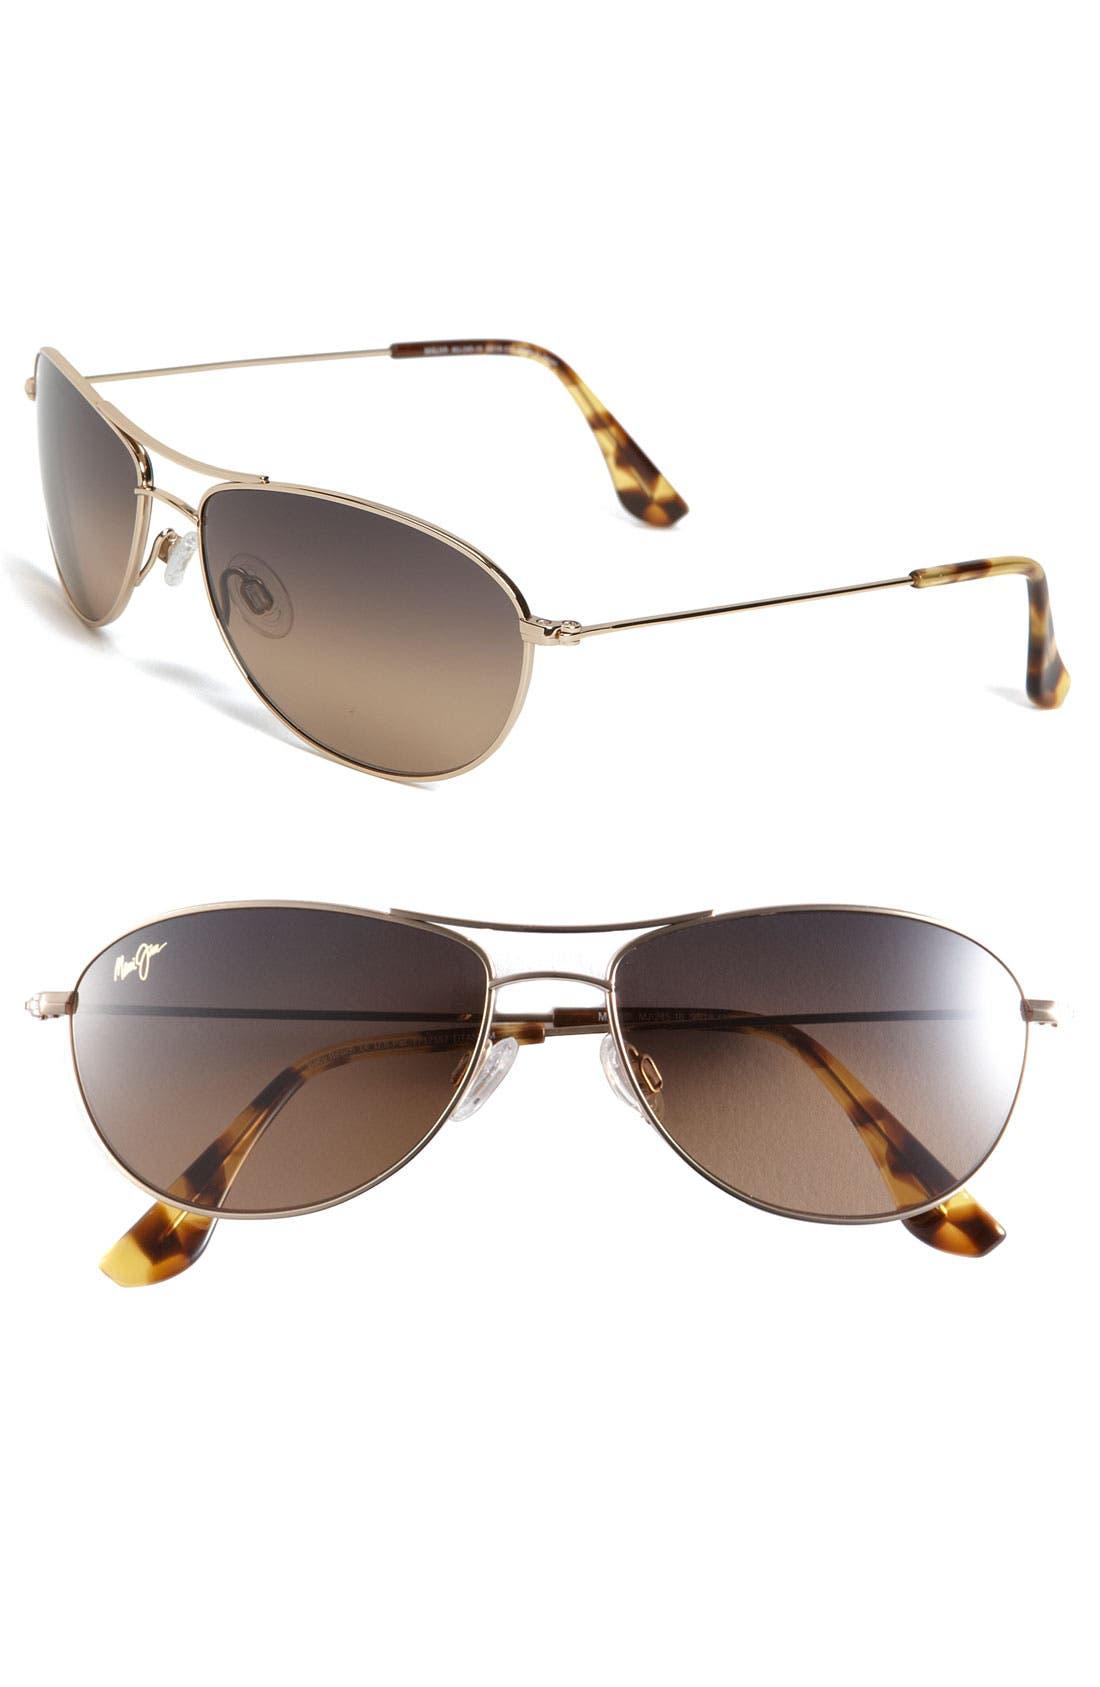 112745a2f6 Women s Maui Jim Sunglasses